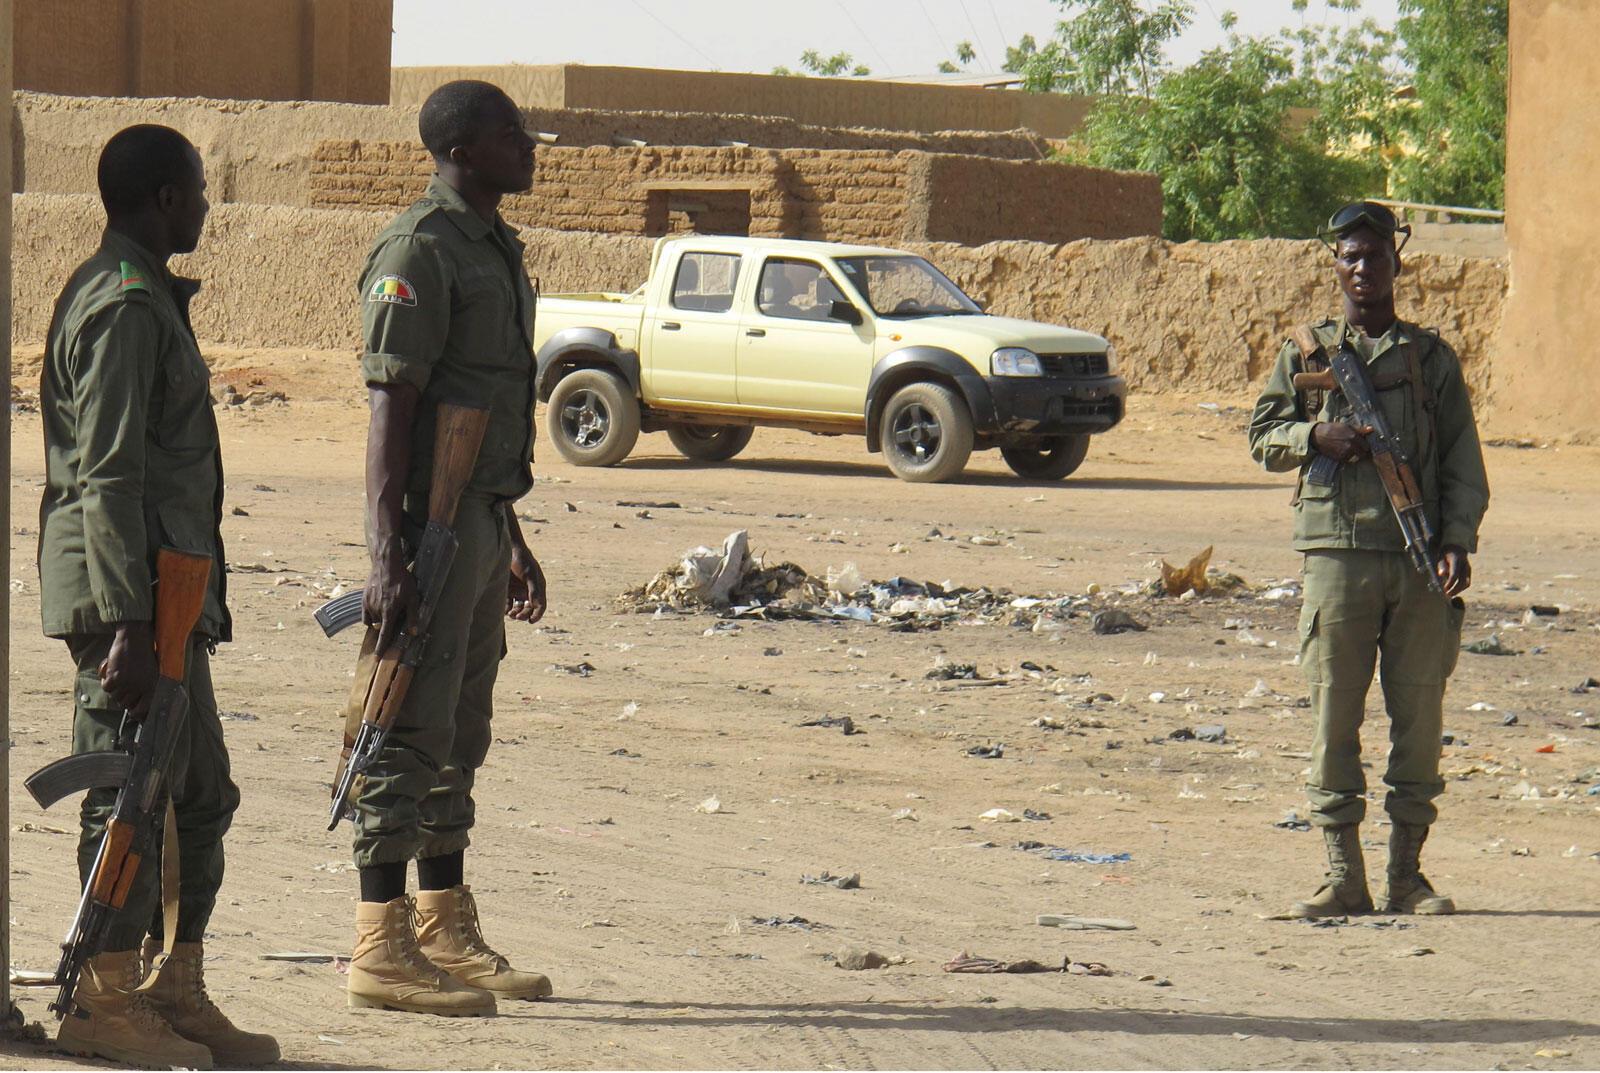 Soldats maliens dans une rue de Gao.